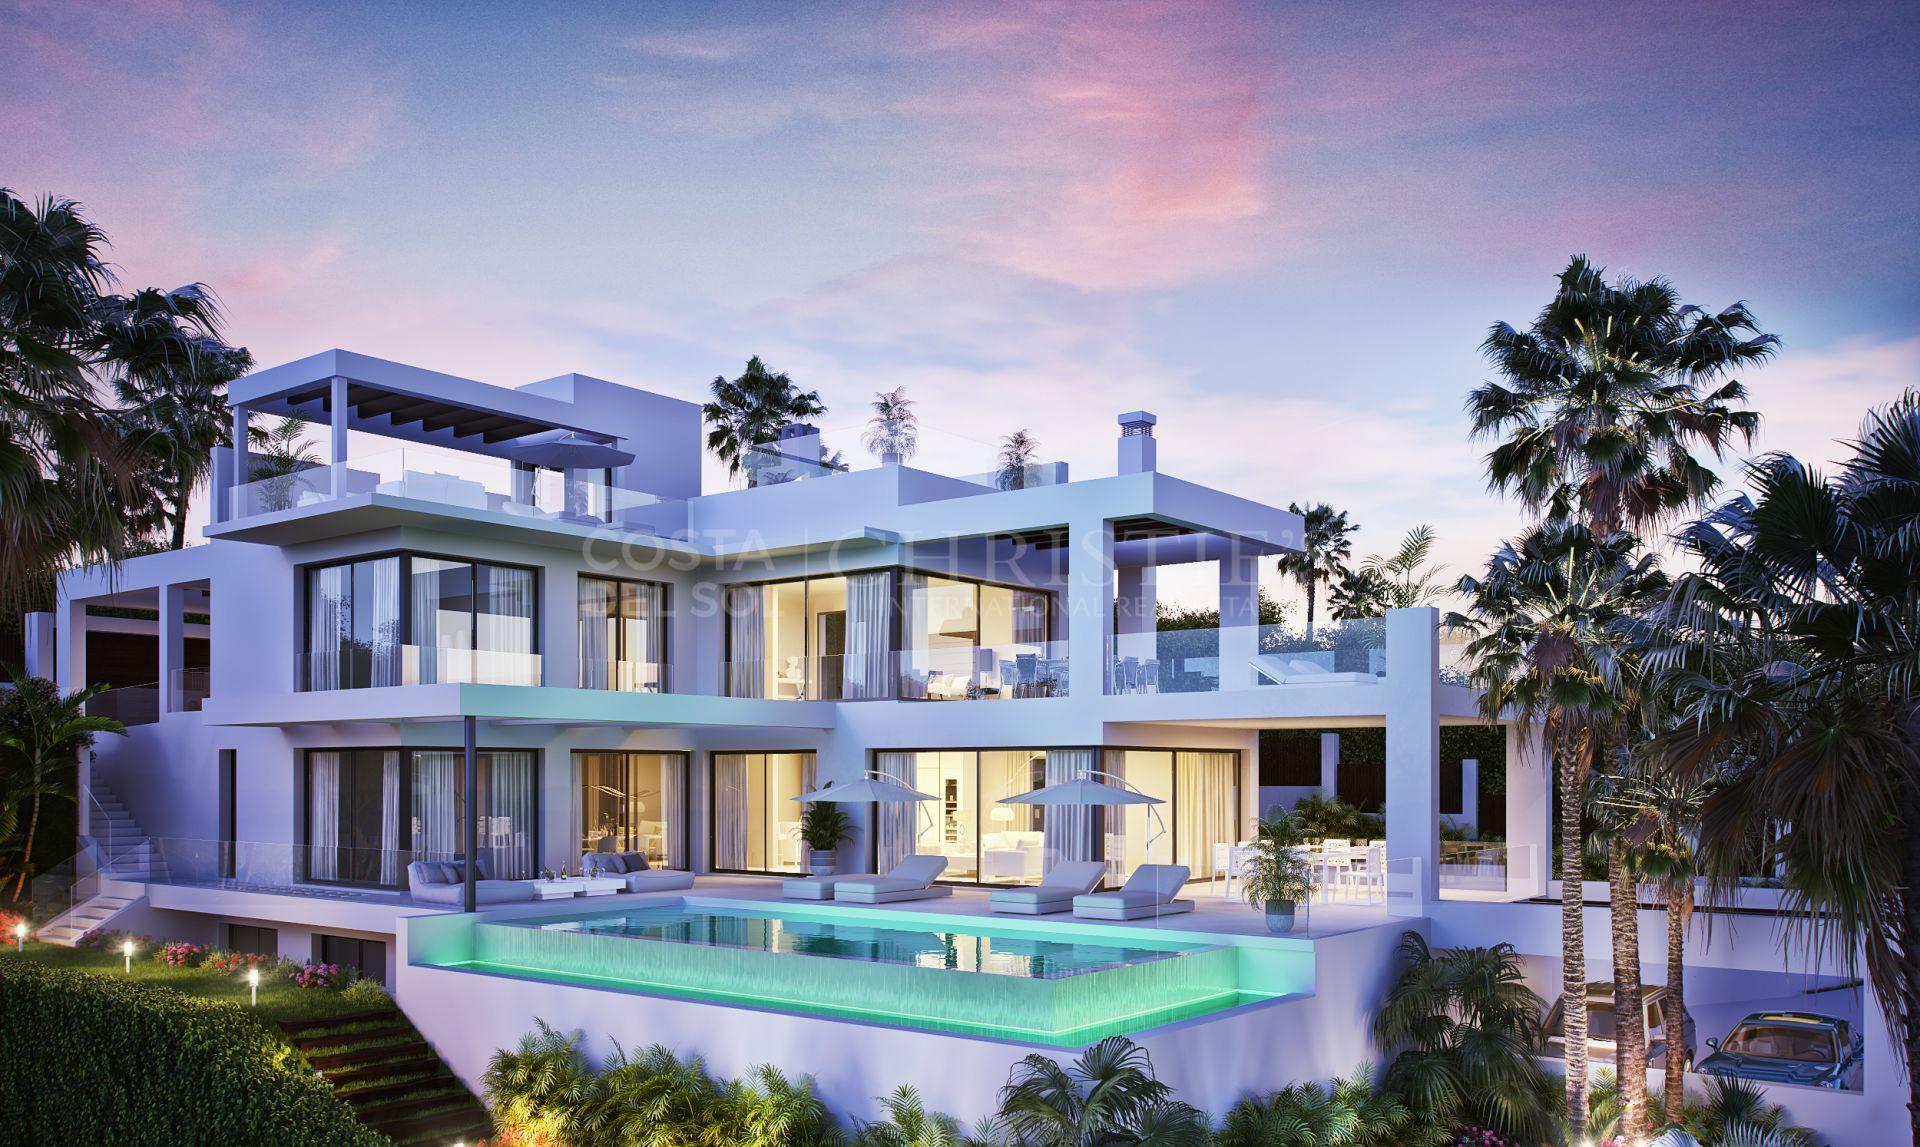 The View Luxury Villas, The View, Estepona - The View Luxury Villas, Marbella | Christie's International Real Estate